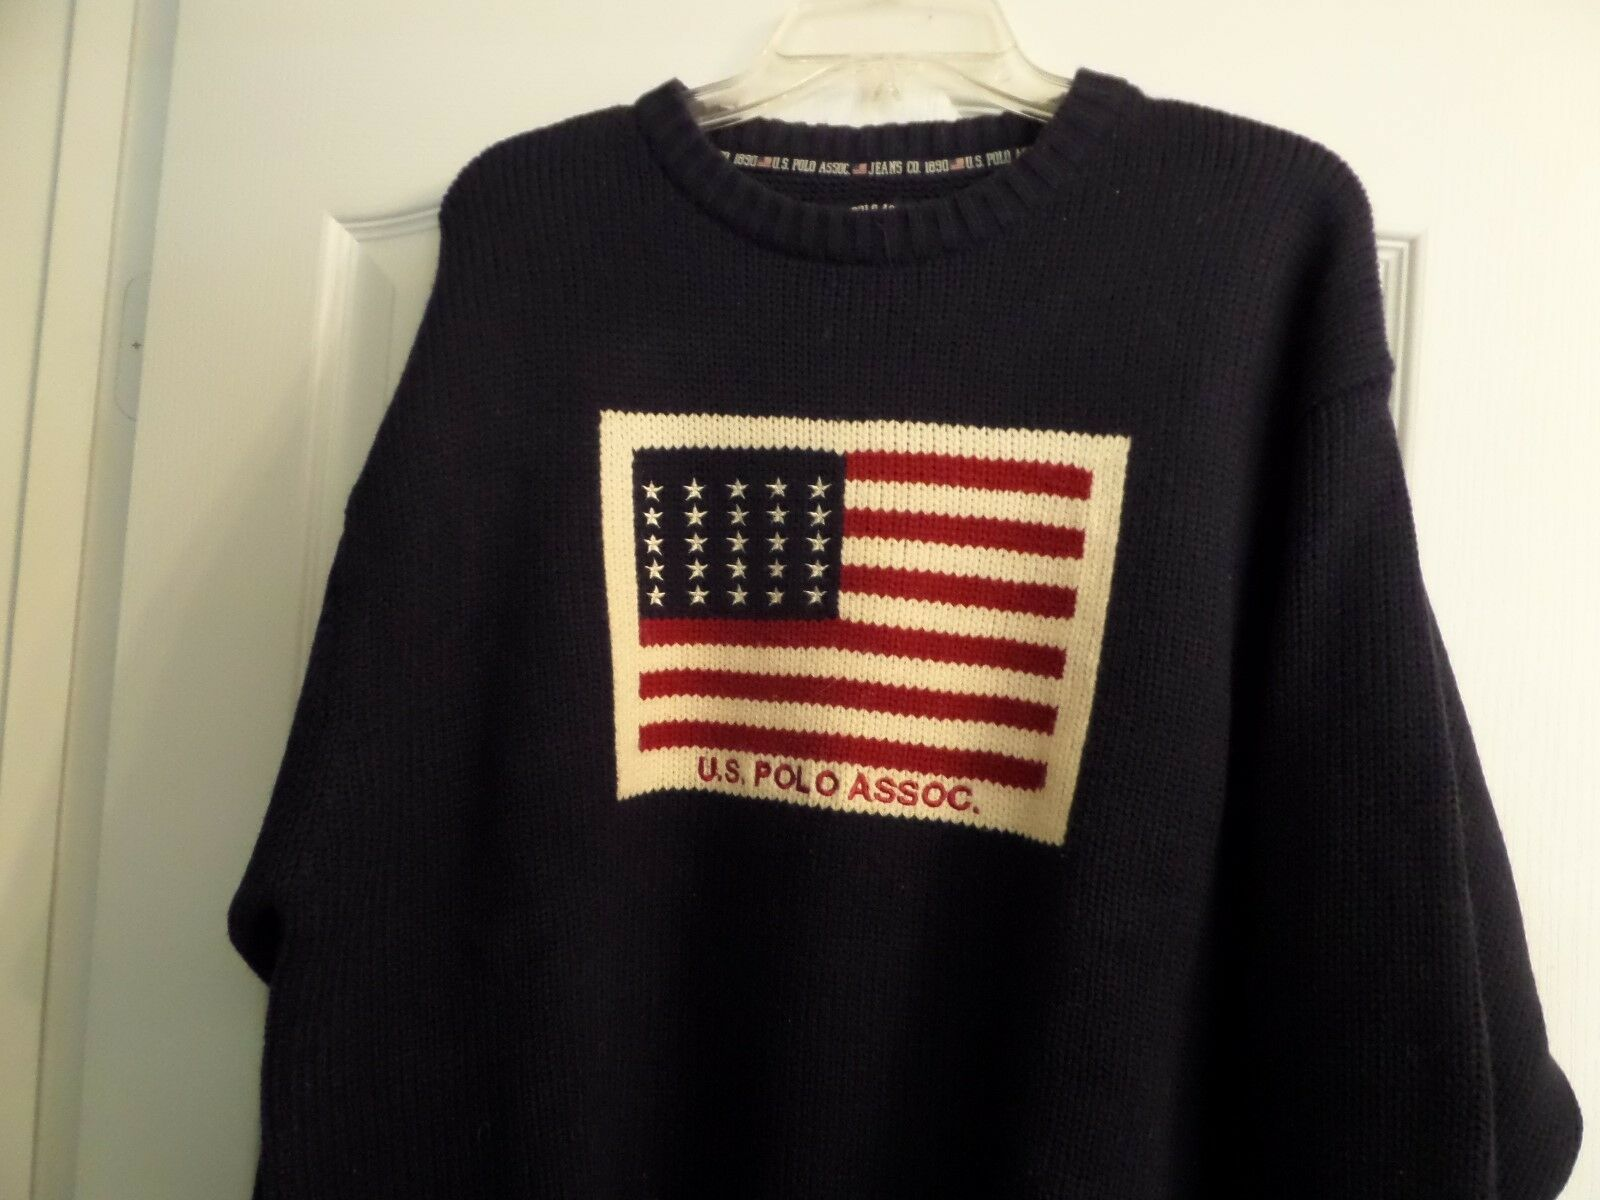 Polo U.S Assoc. Vintage Sweater Dark bluee American Flag Size L